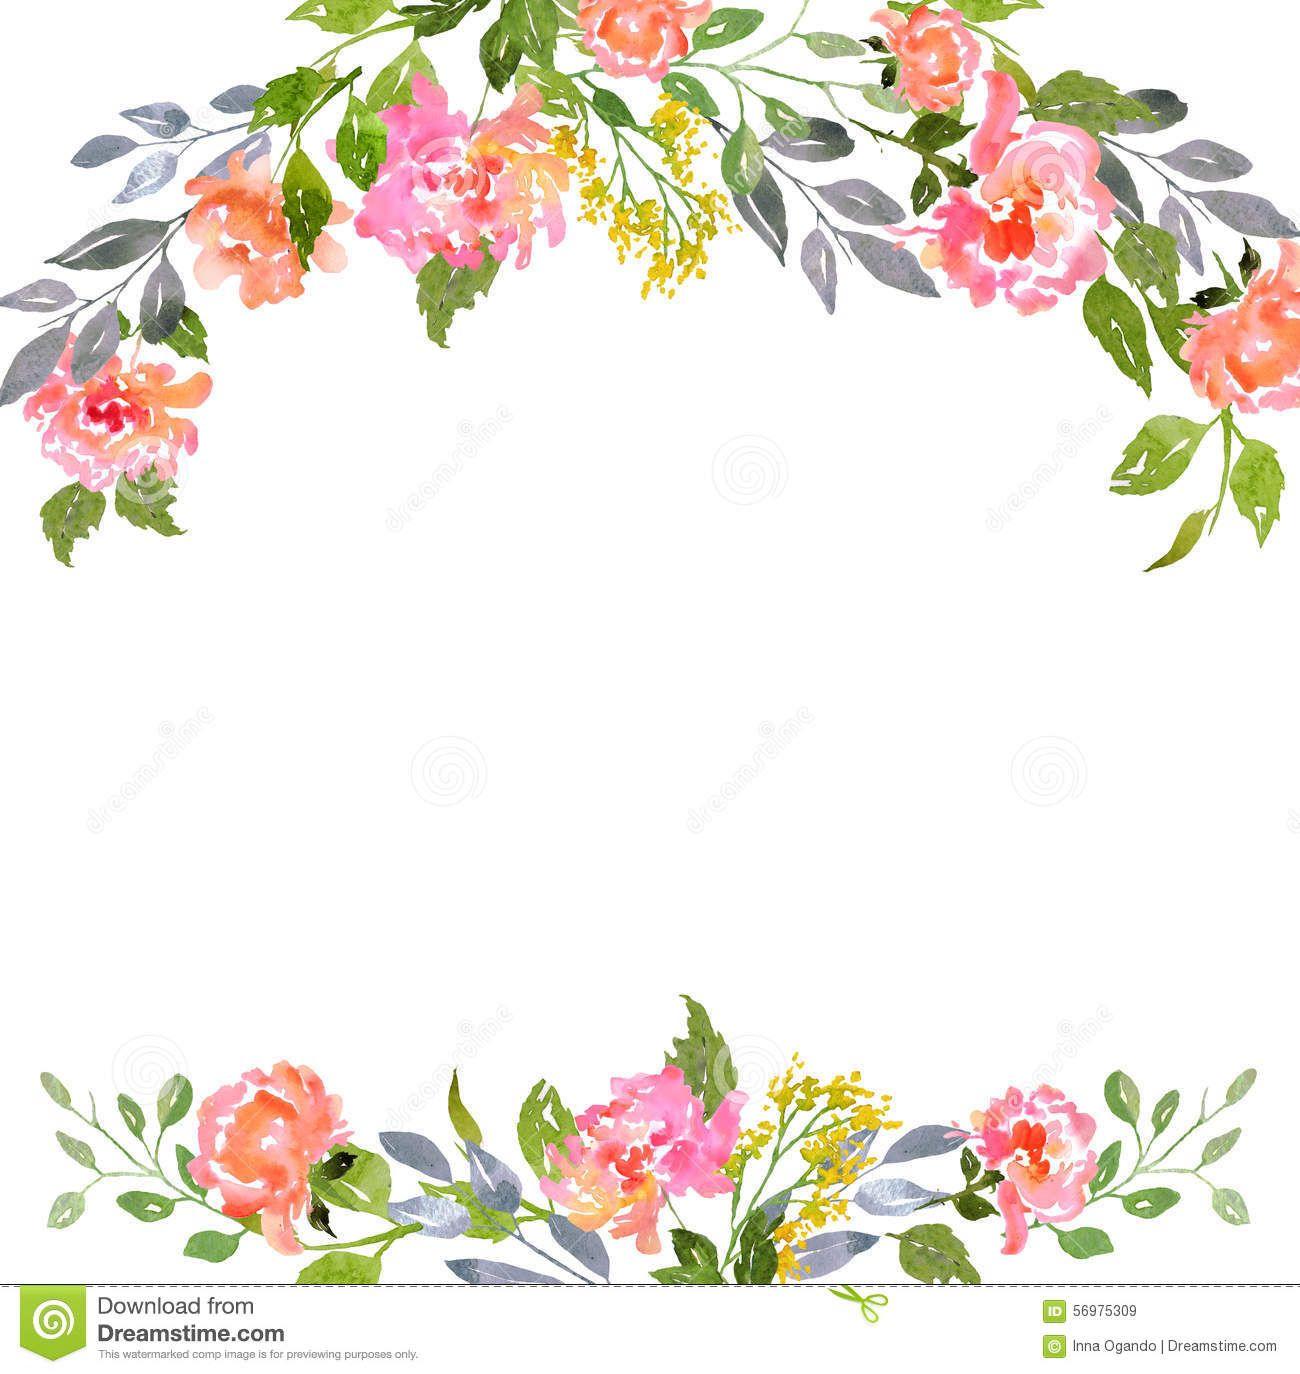 picture about Watercolor Floral Border Paper Printable called Watercolor Floral Border Paper Printable - menu template structure